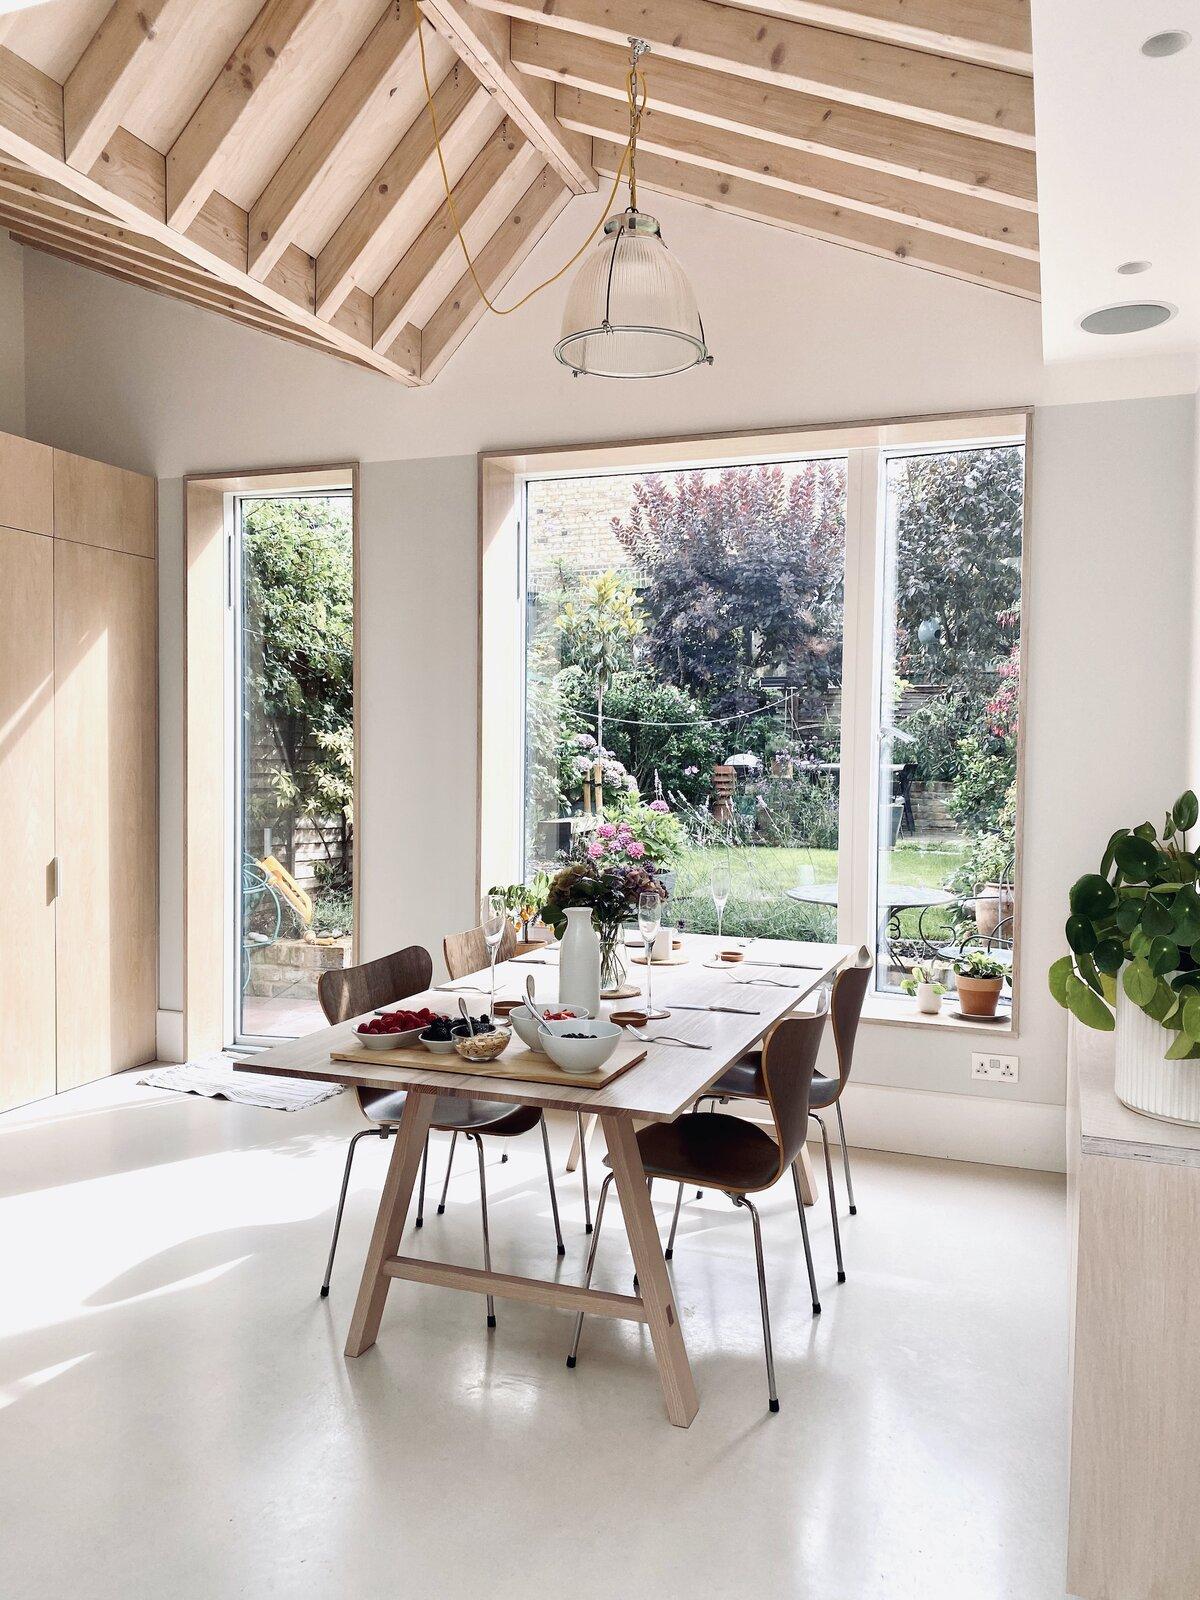 zigzag roof interior of kitchen extension